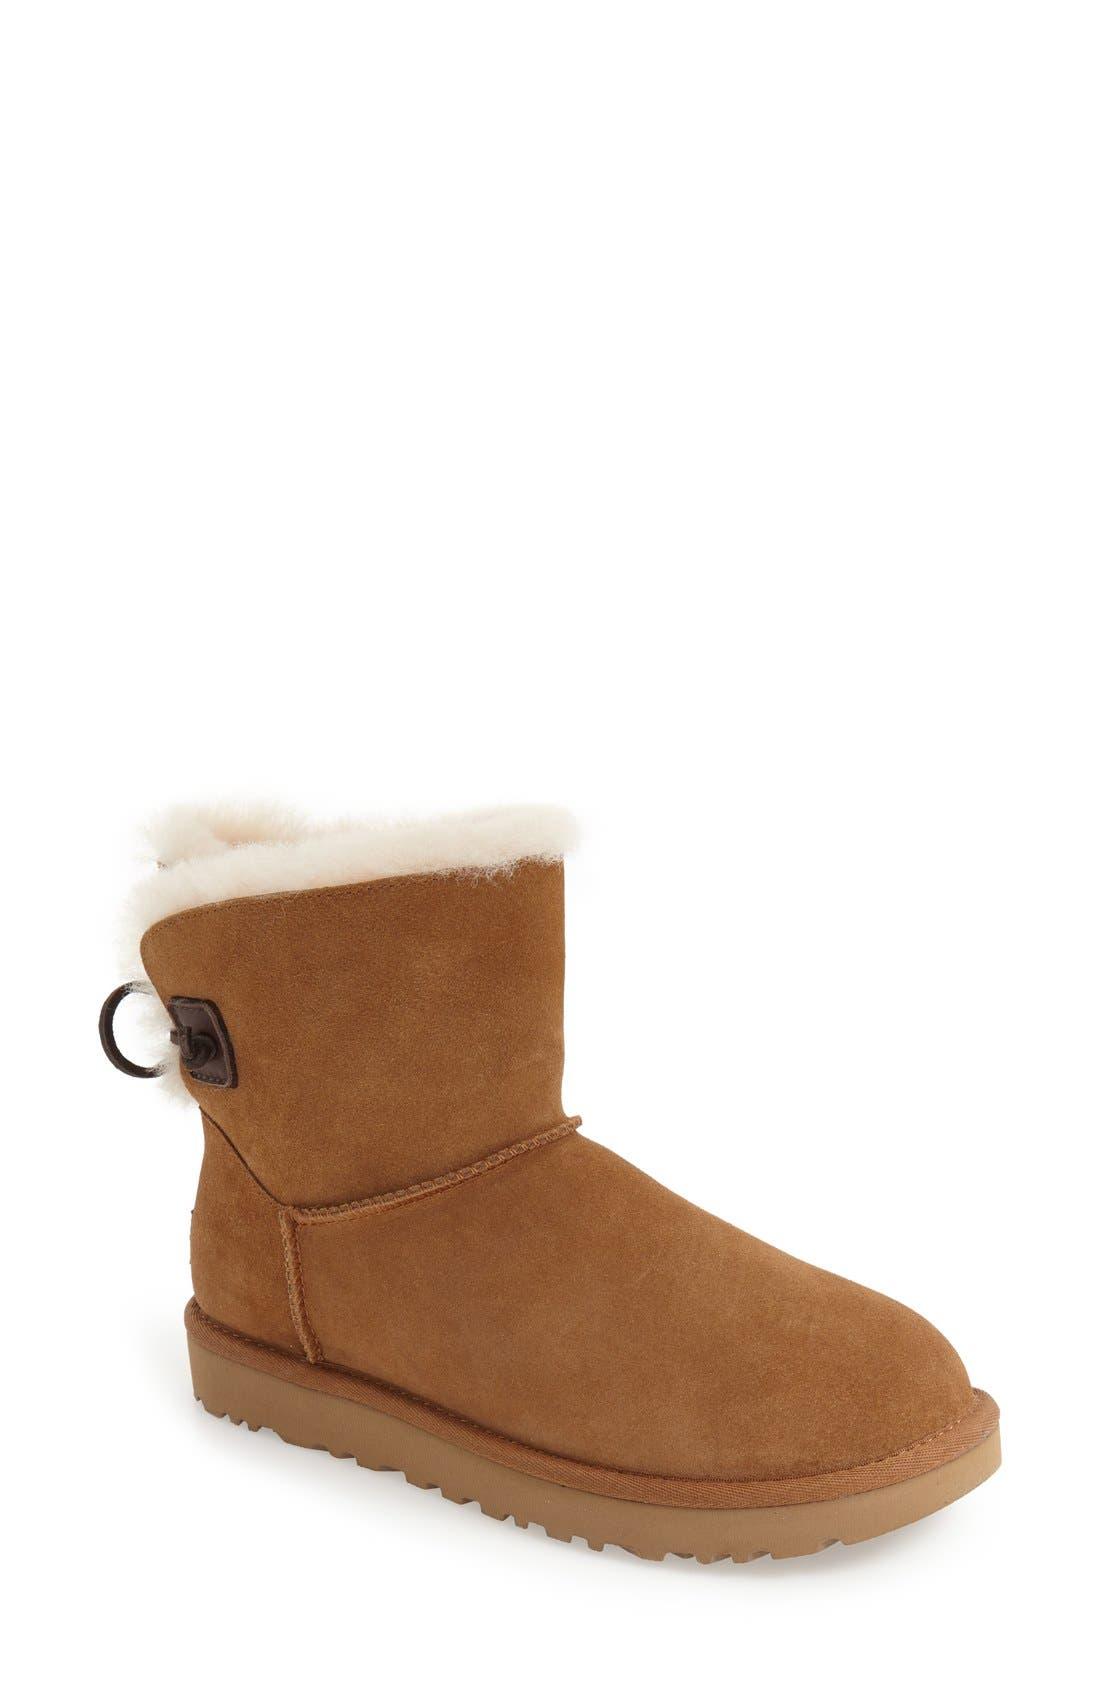 Main Image - UGG® Adoria - Tehuano Short Boot (Women)